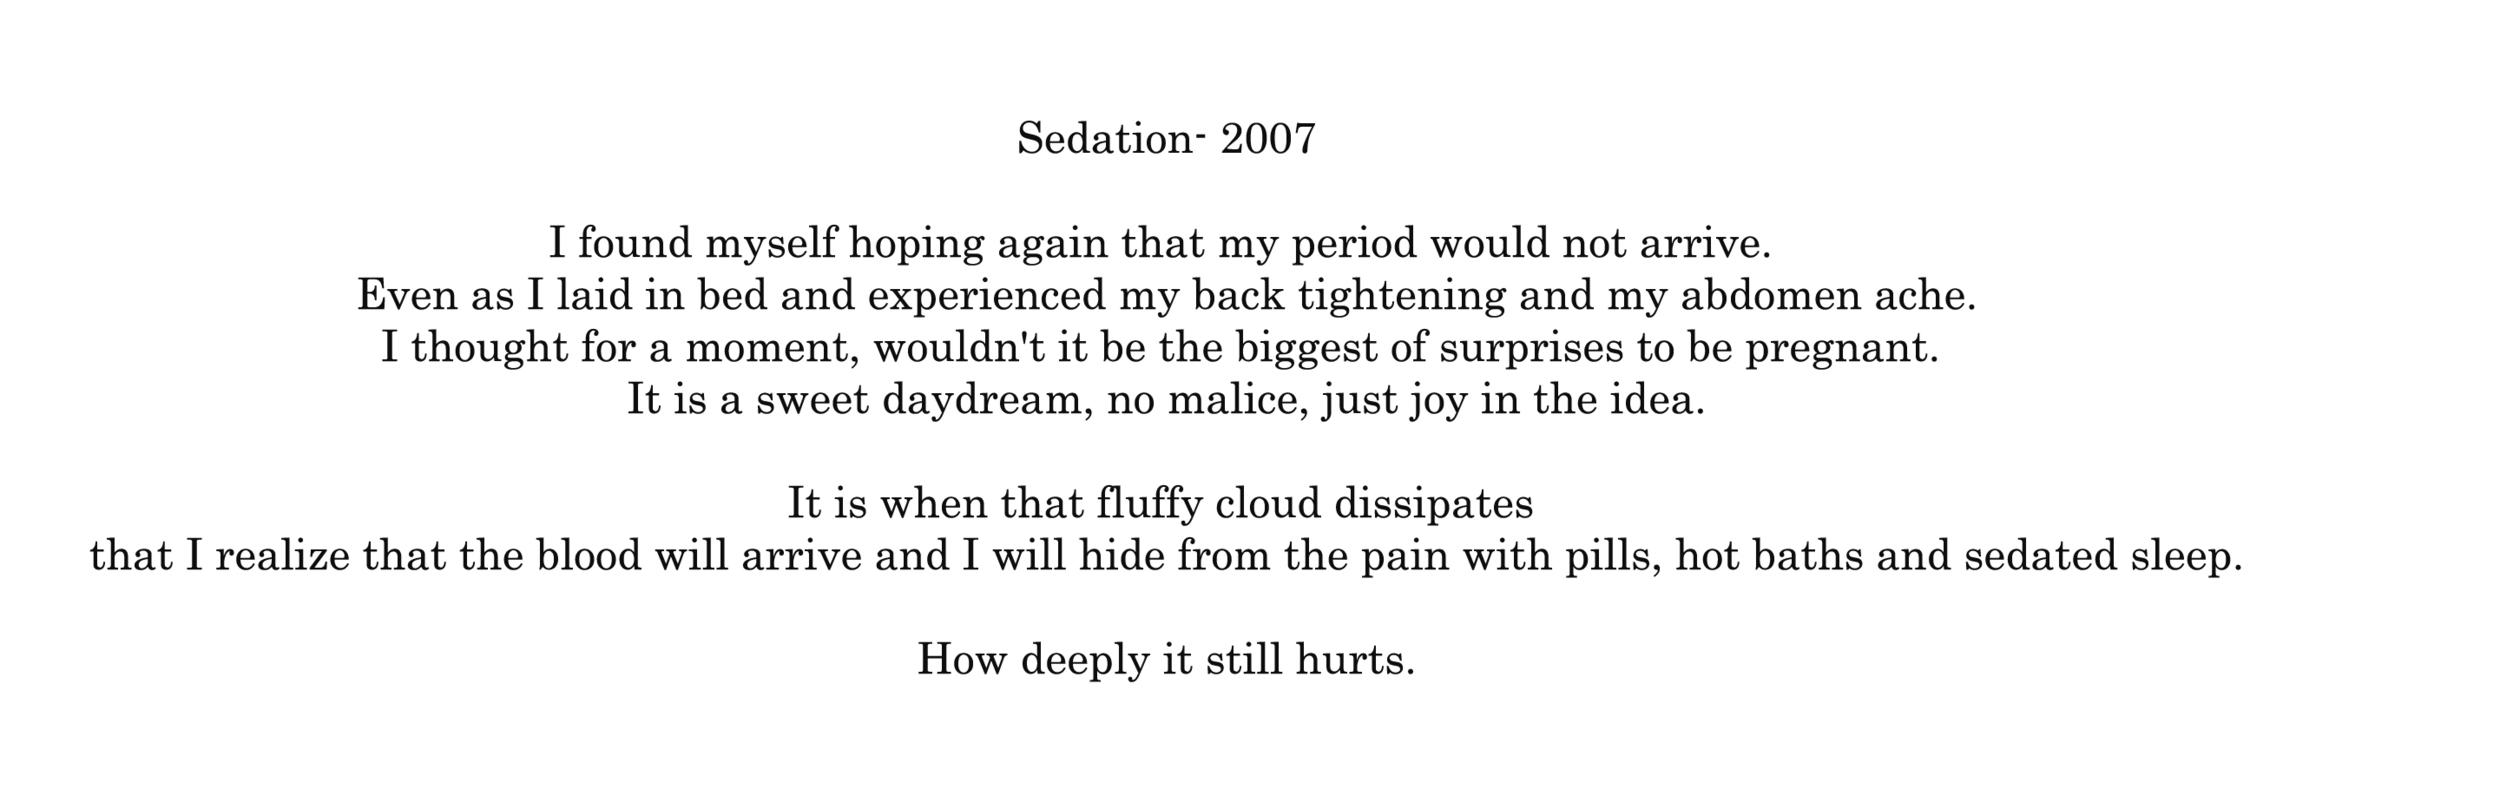 text 3 sedation copy.jpg